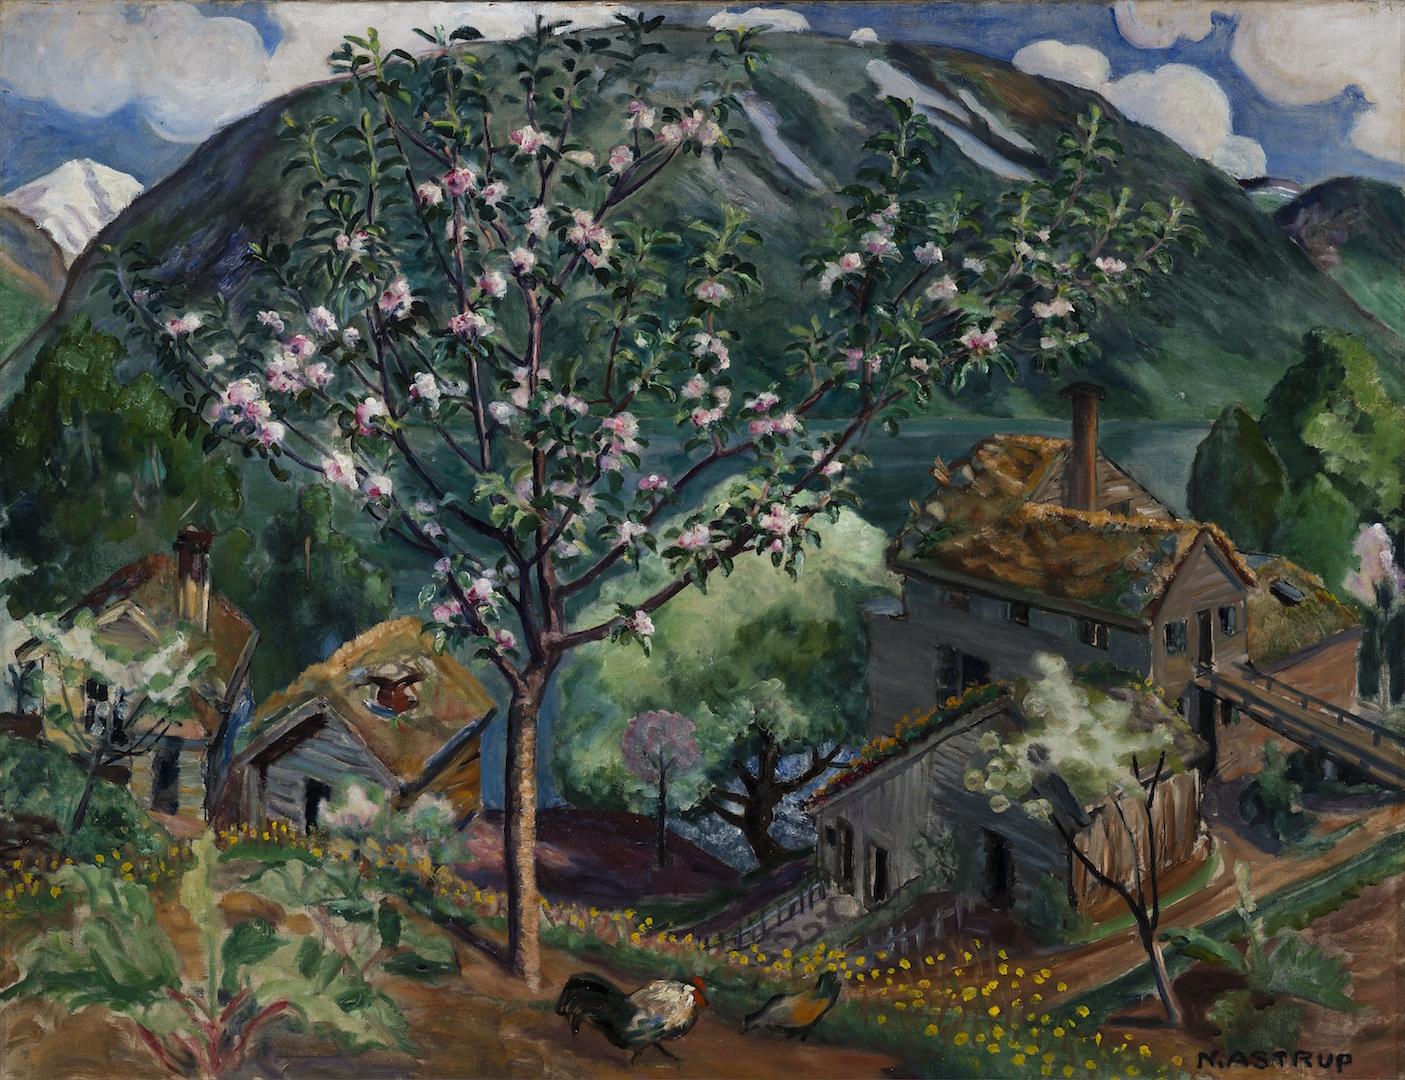 Nikolai Astrup, Epletre i blomst, ca. 1927. Sparebankstiftelsen – DNB